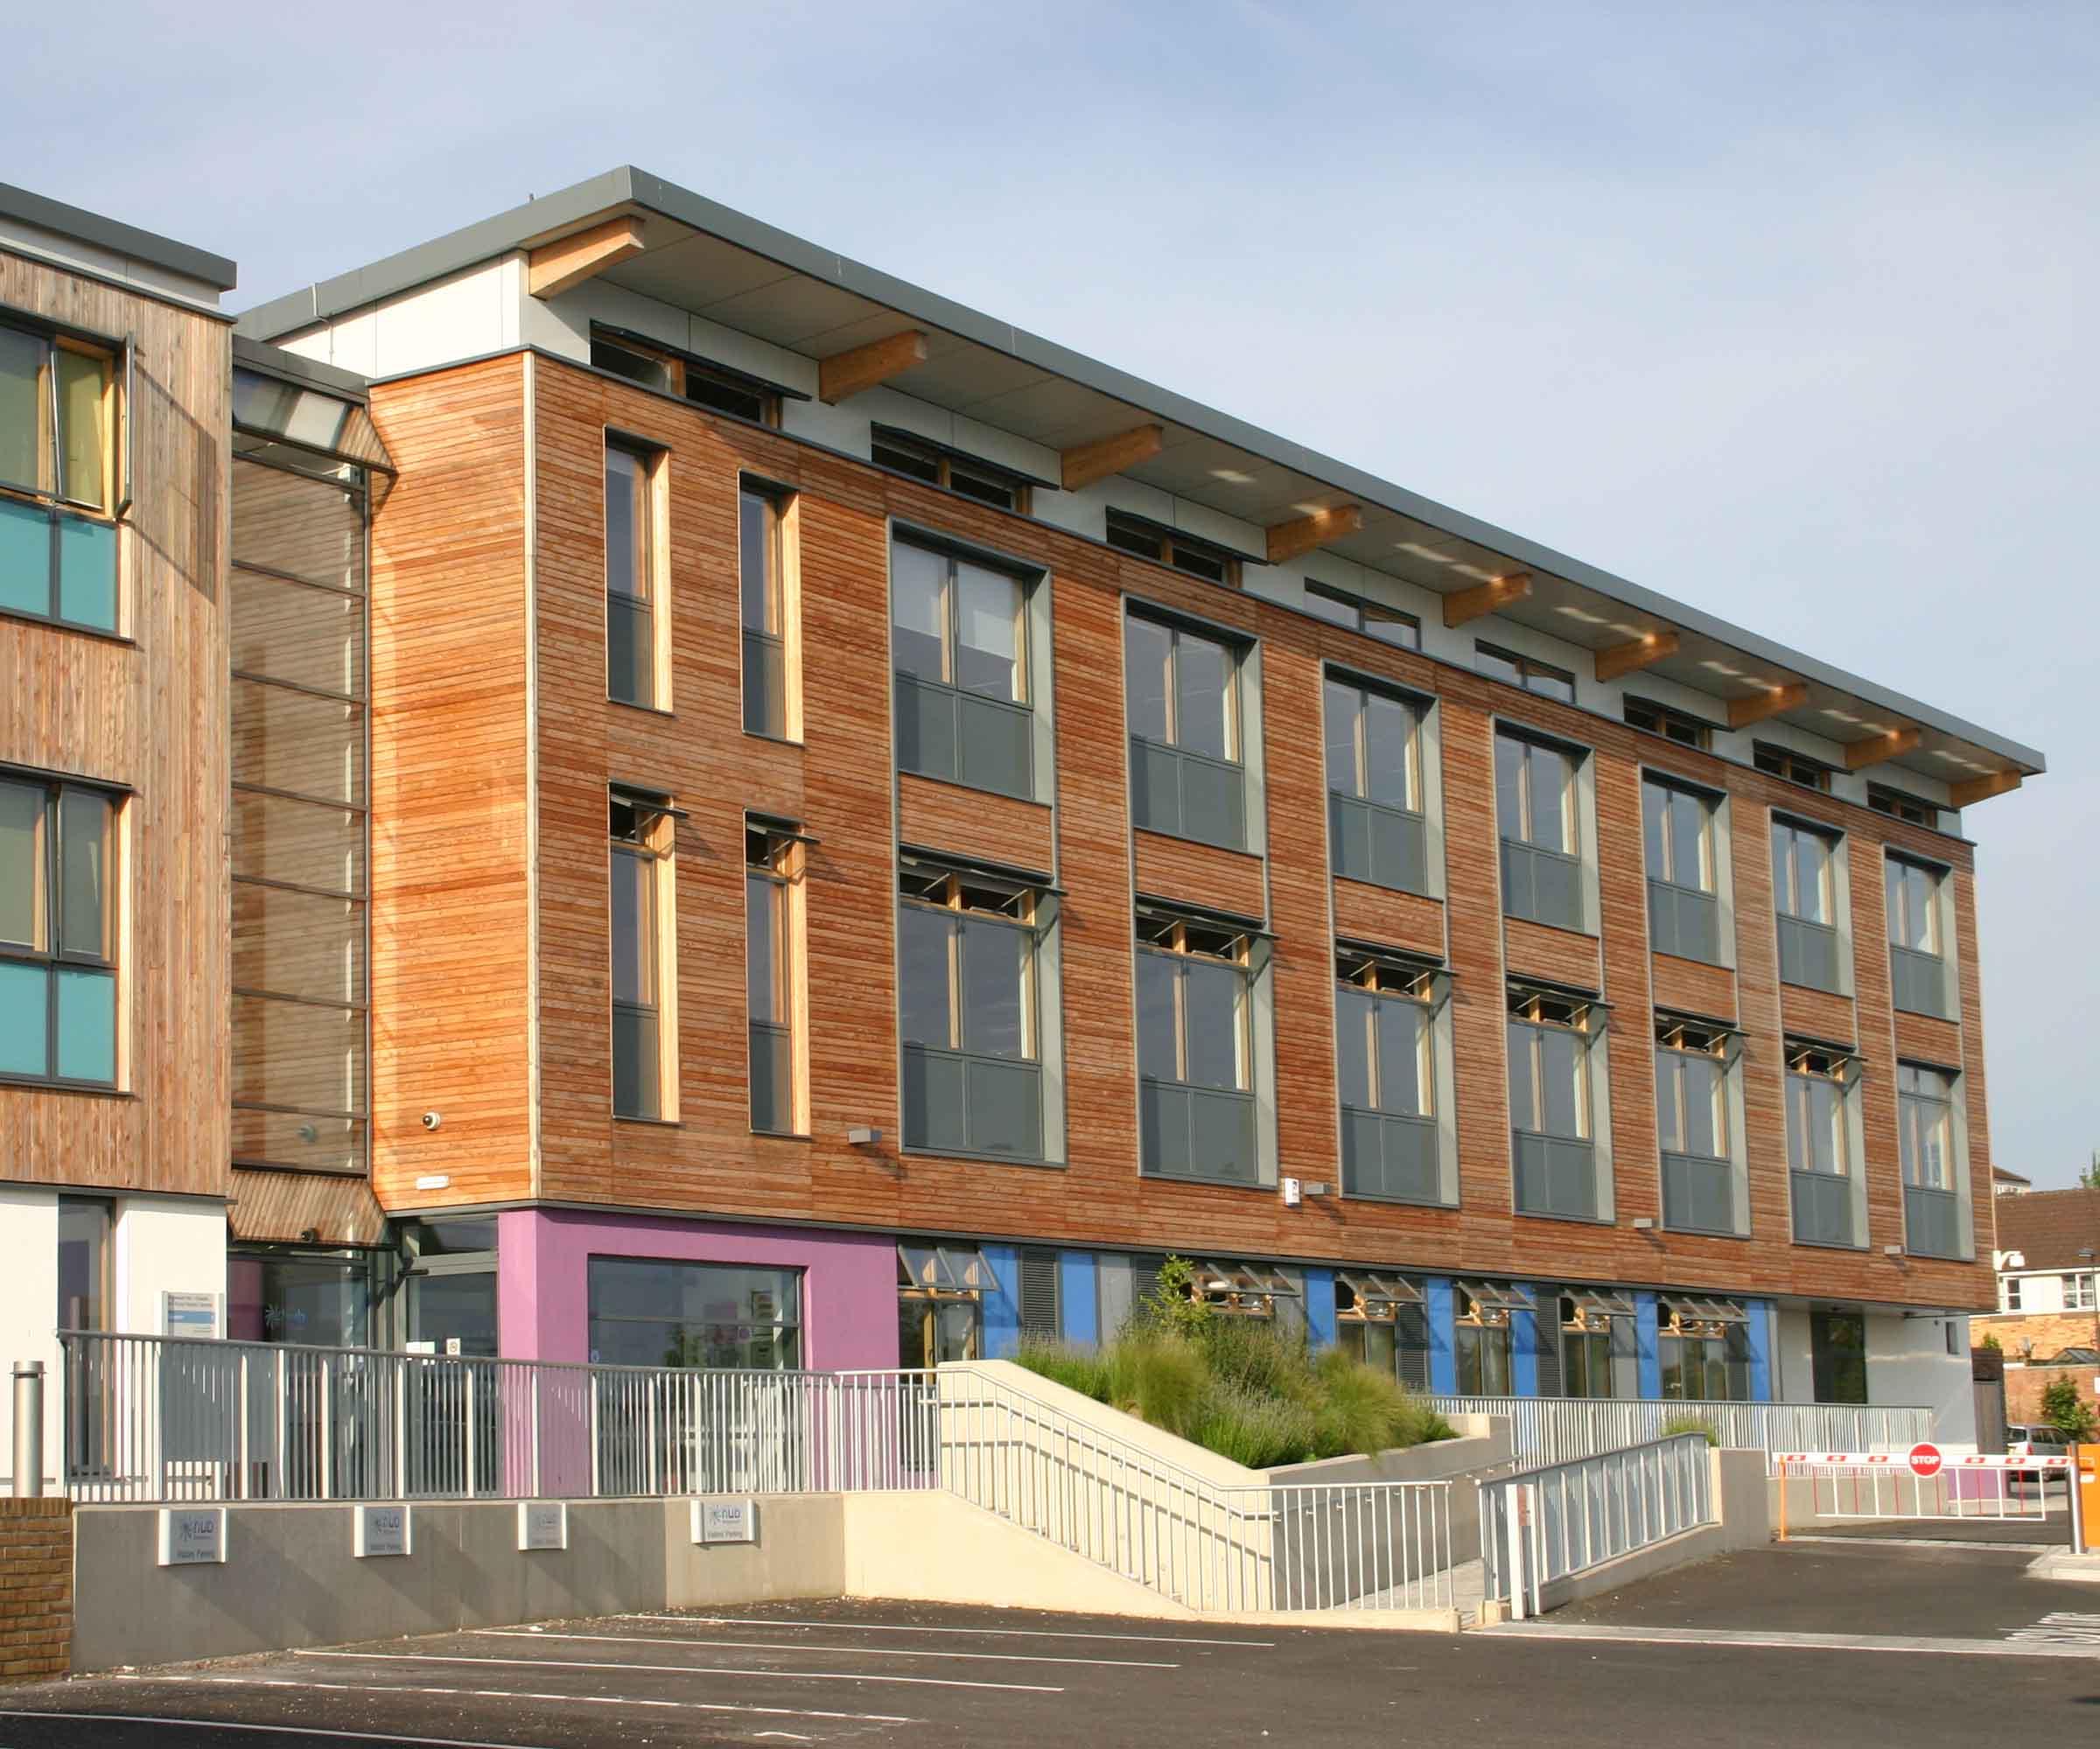 alumasc exterior building products ltd case studies